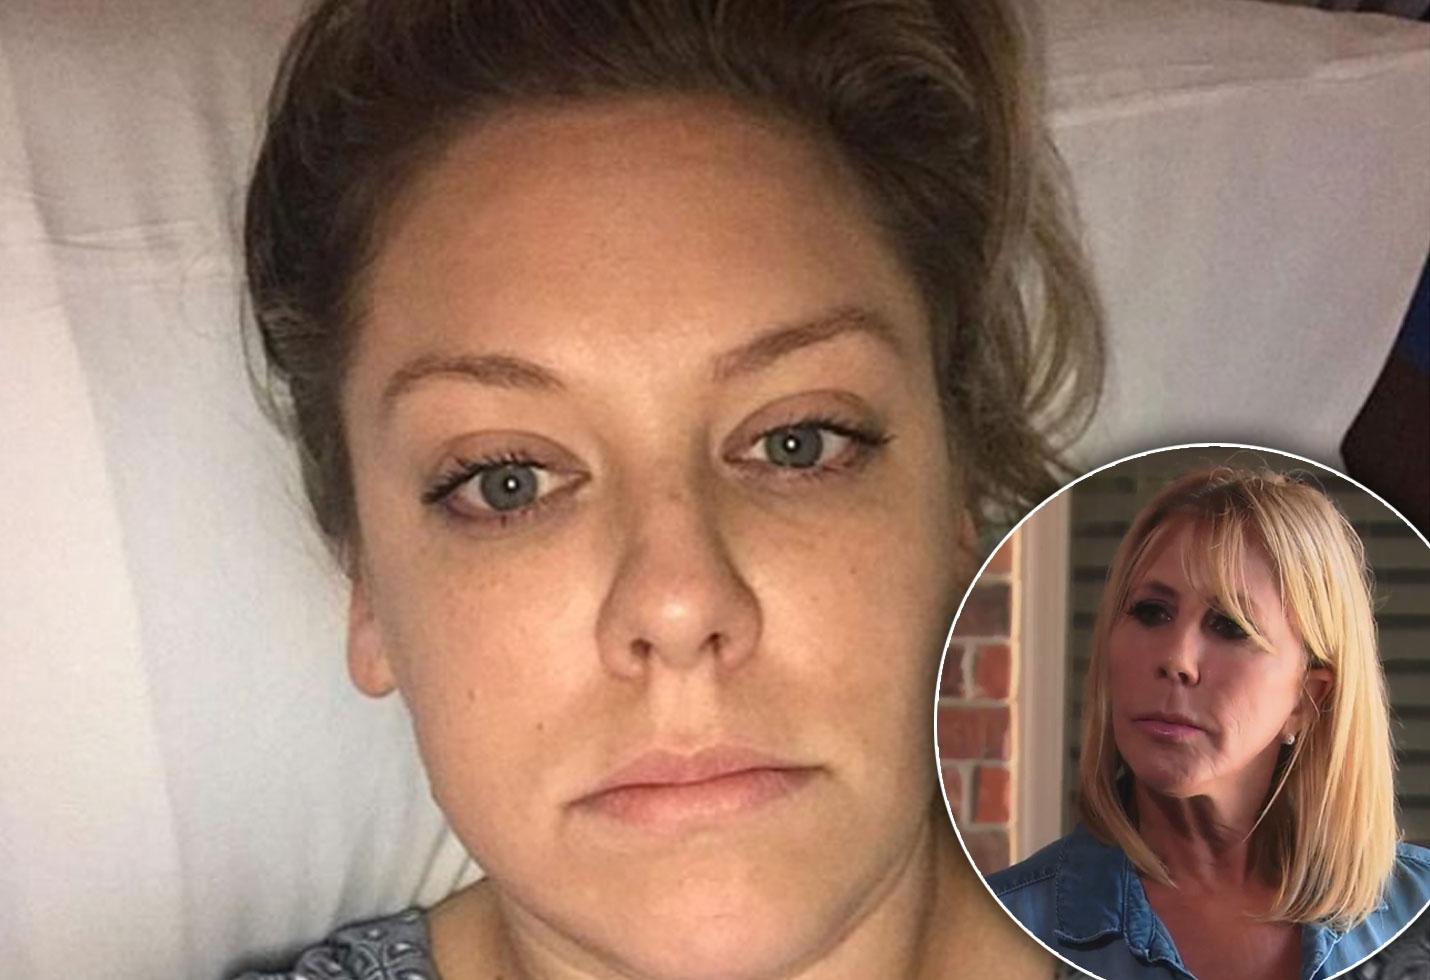 Vicki Gunvalsons Daughter Briana Culberson Hospitalized